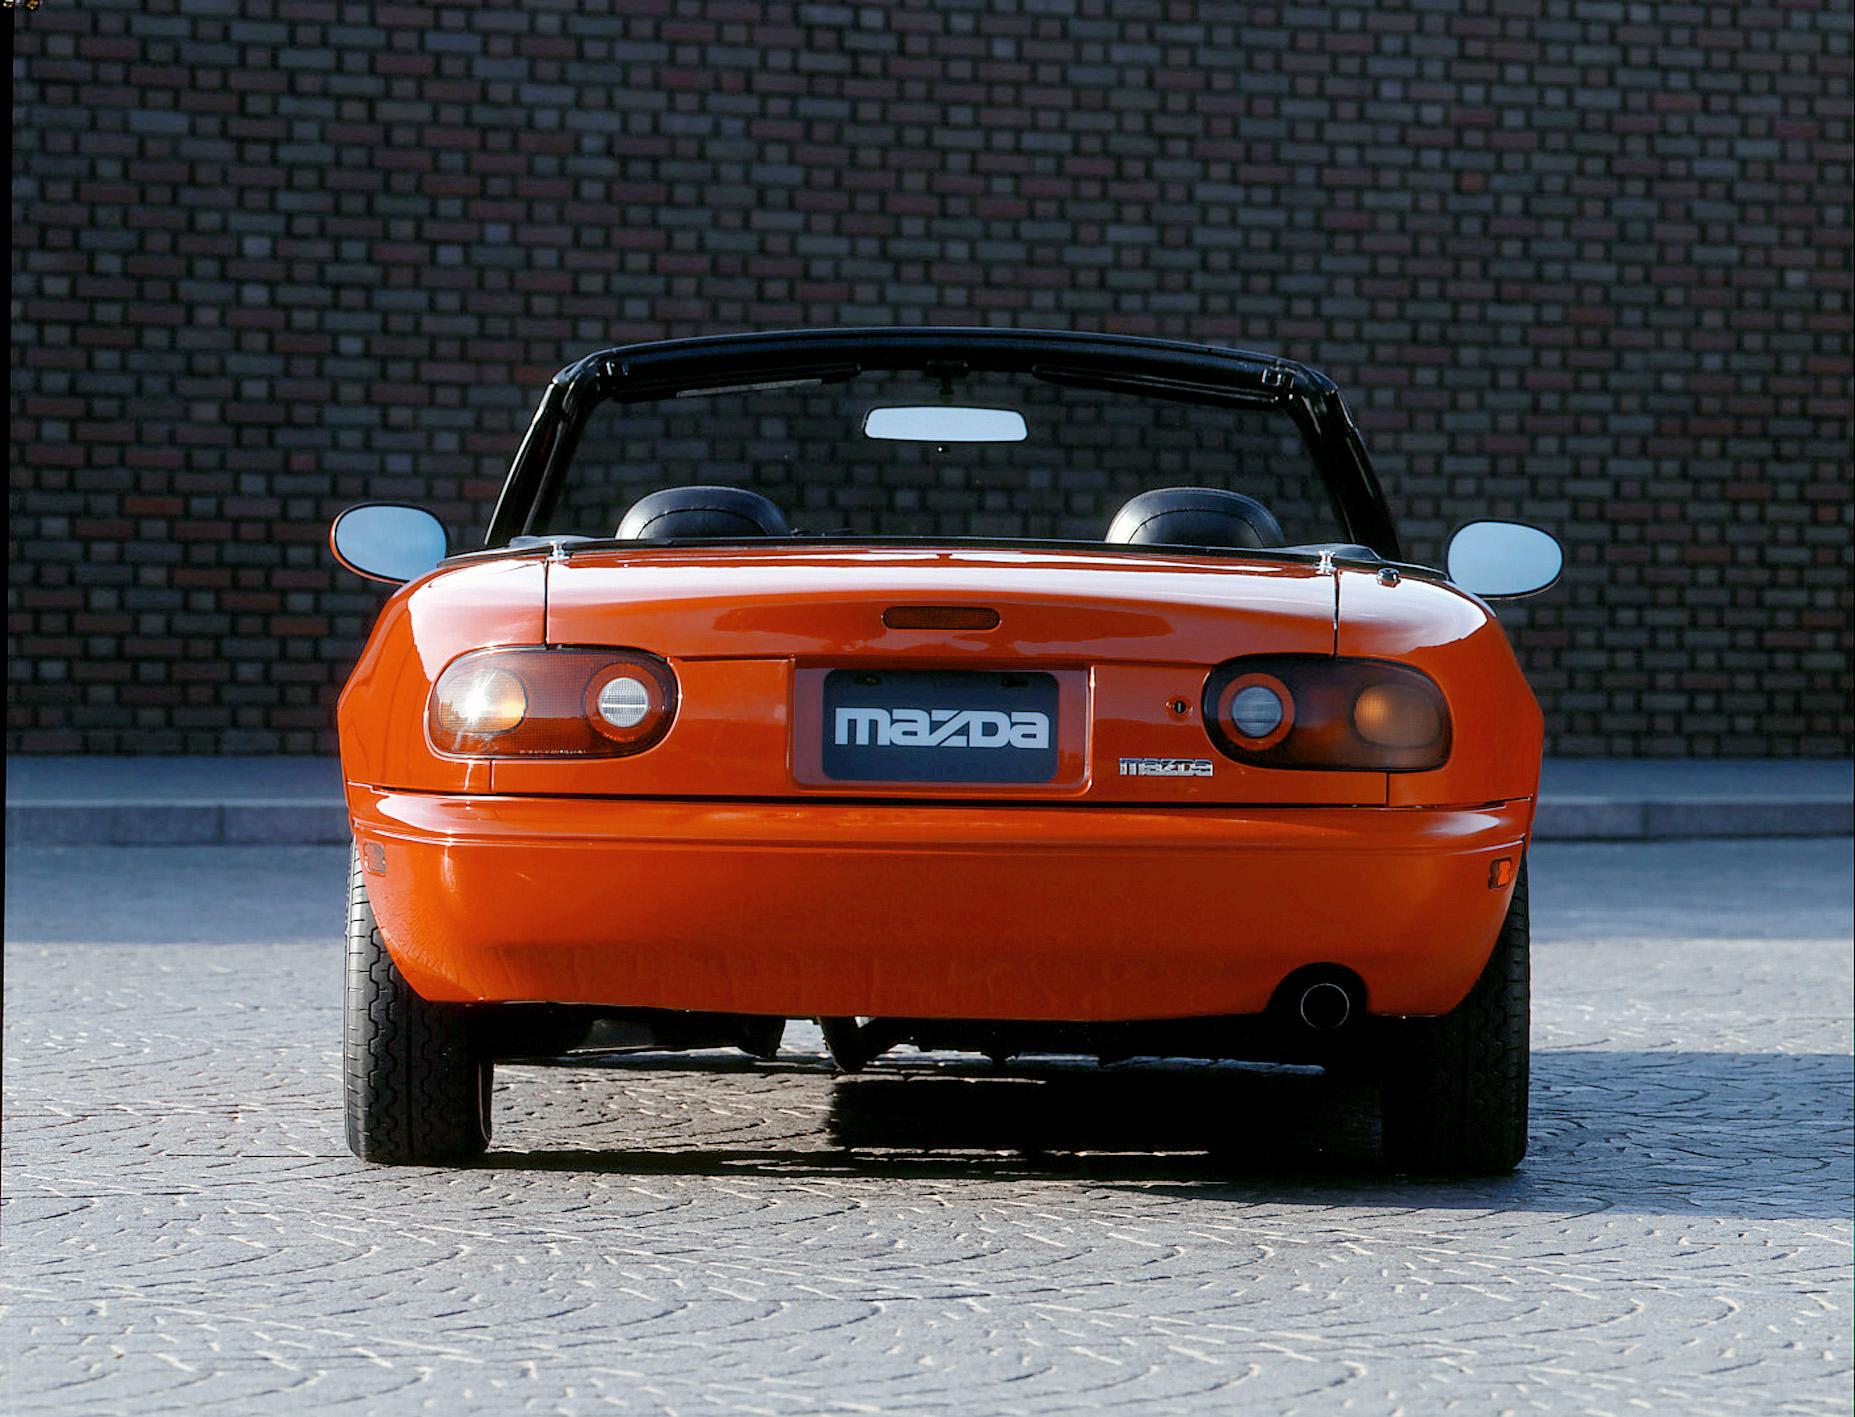 1990 mazda mx5 miata rear red